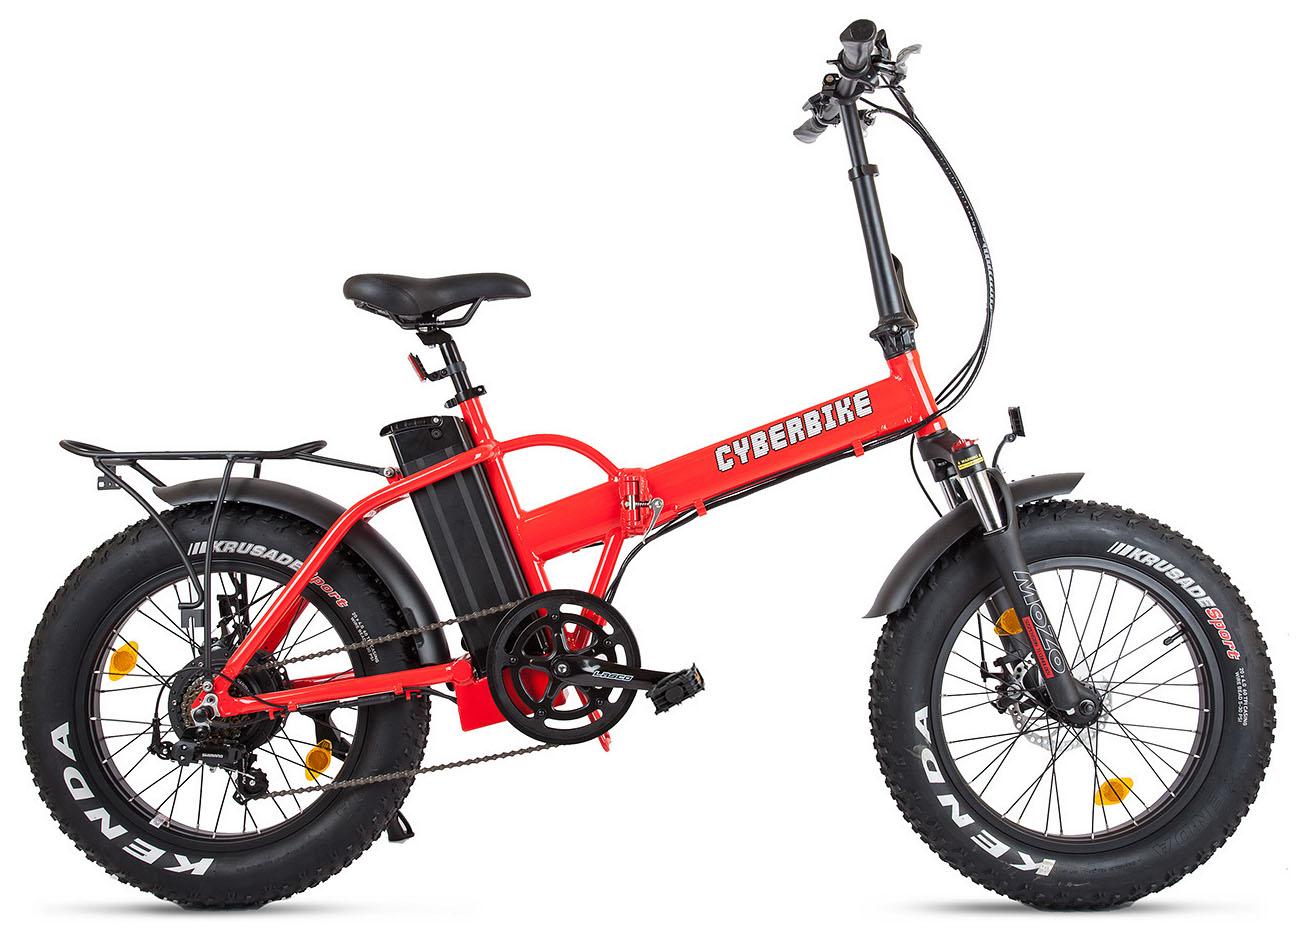 Велосипед Eltreco Cyberbike Fat 500W 2018 велосипед eltreco cyberbike fat 500w 2018